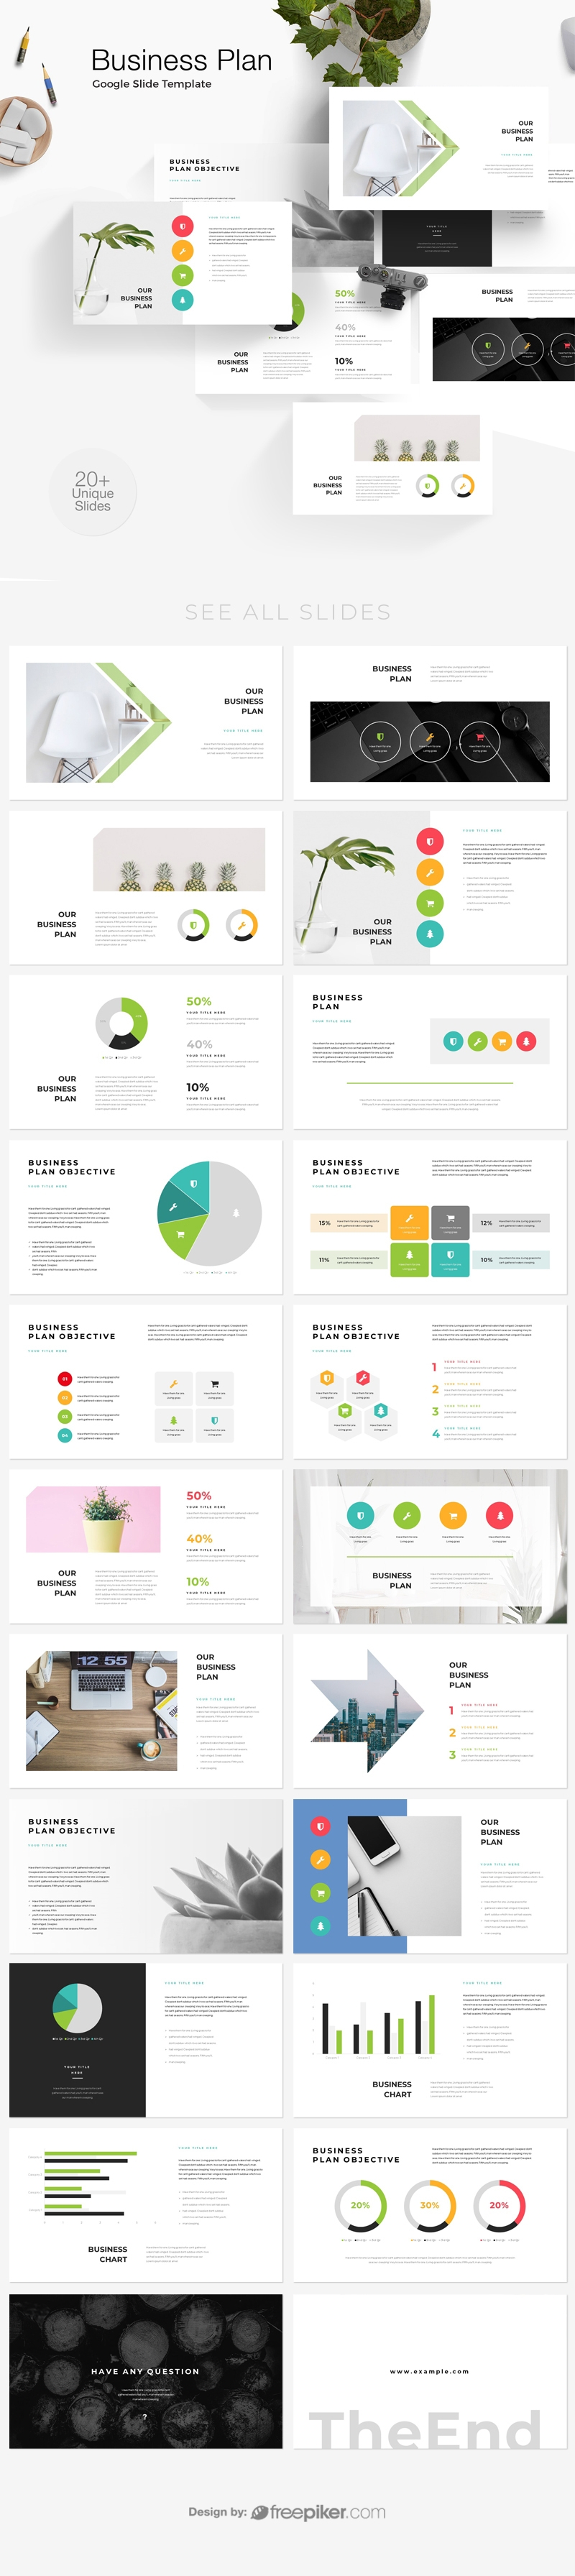 Business Plan & Objectives Google Slide Template